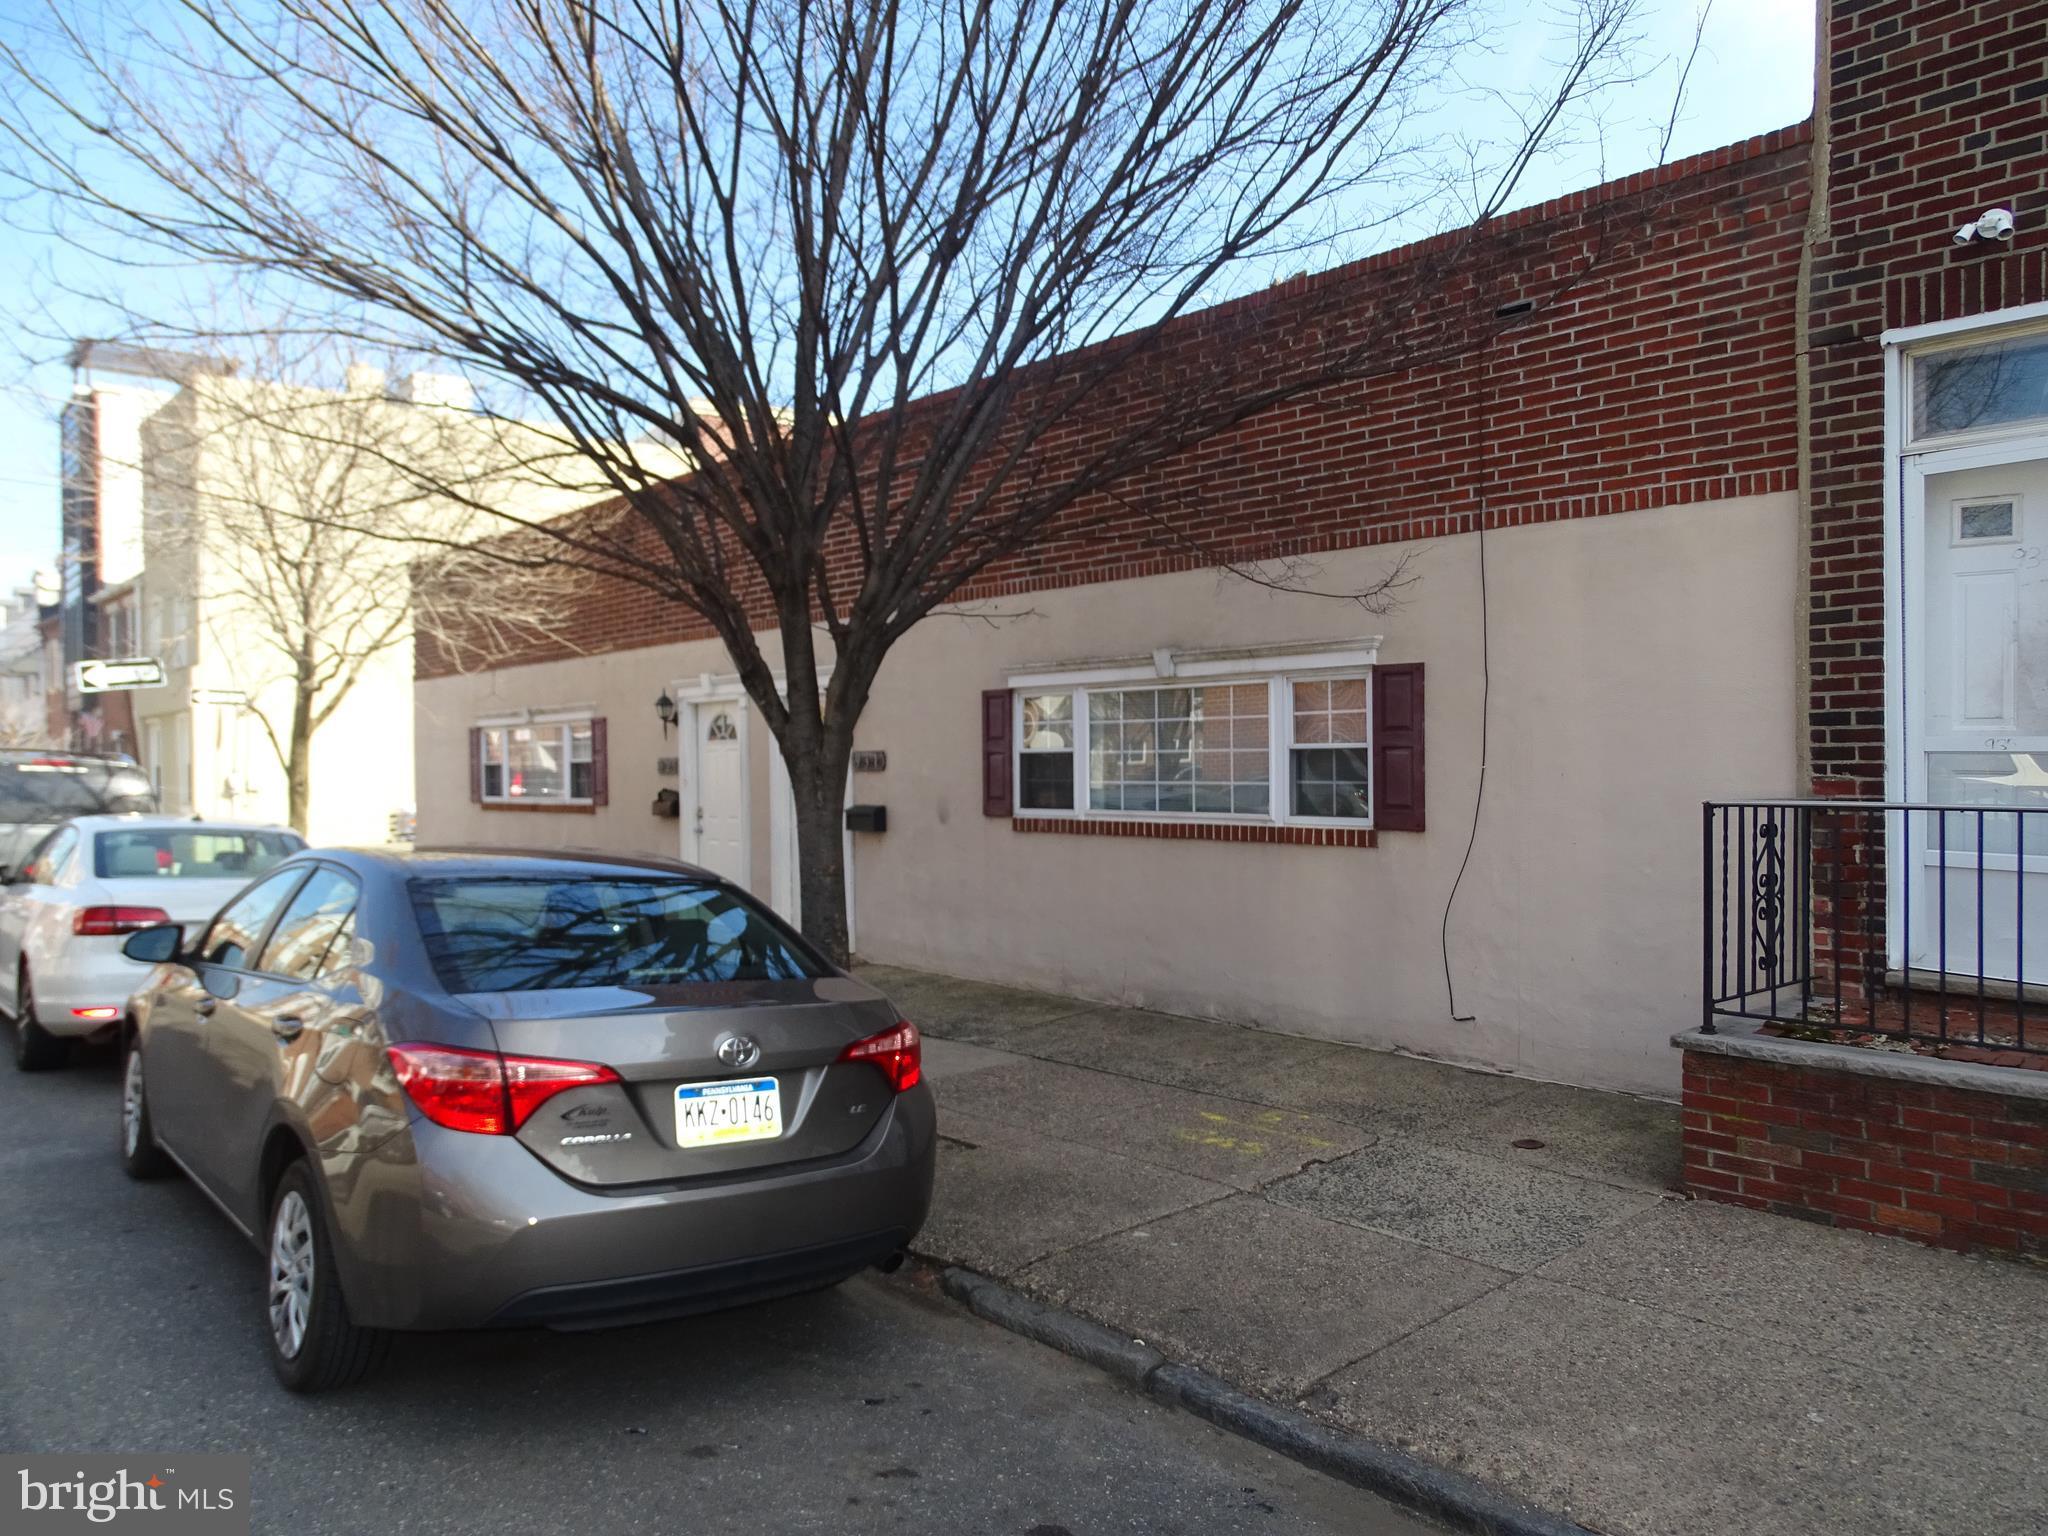 925-929 S 3RD St, Philadelphia, PA, 19147